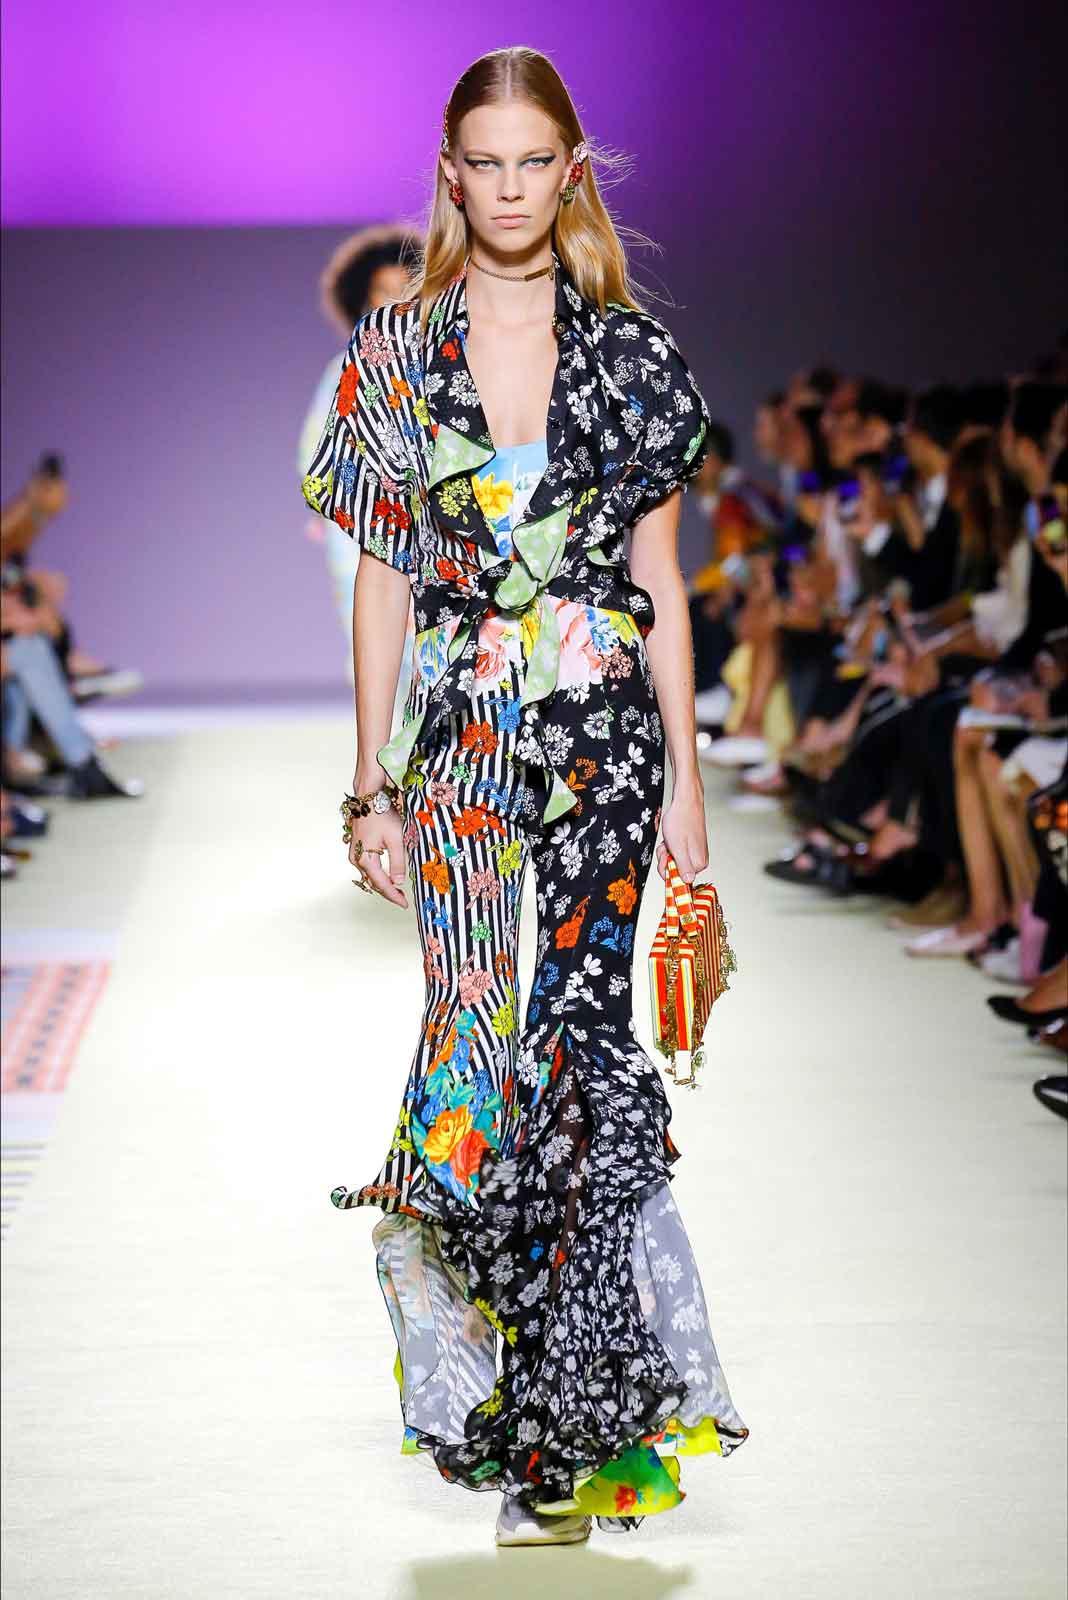 News Orizzonte 2019 Primaveraestate Italia Moda Magazine l1TcFJK3